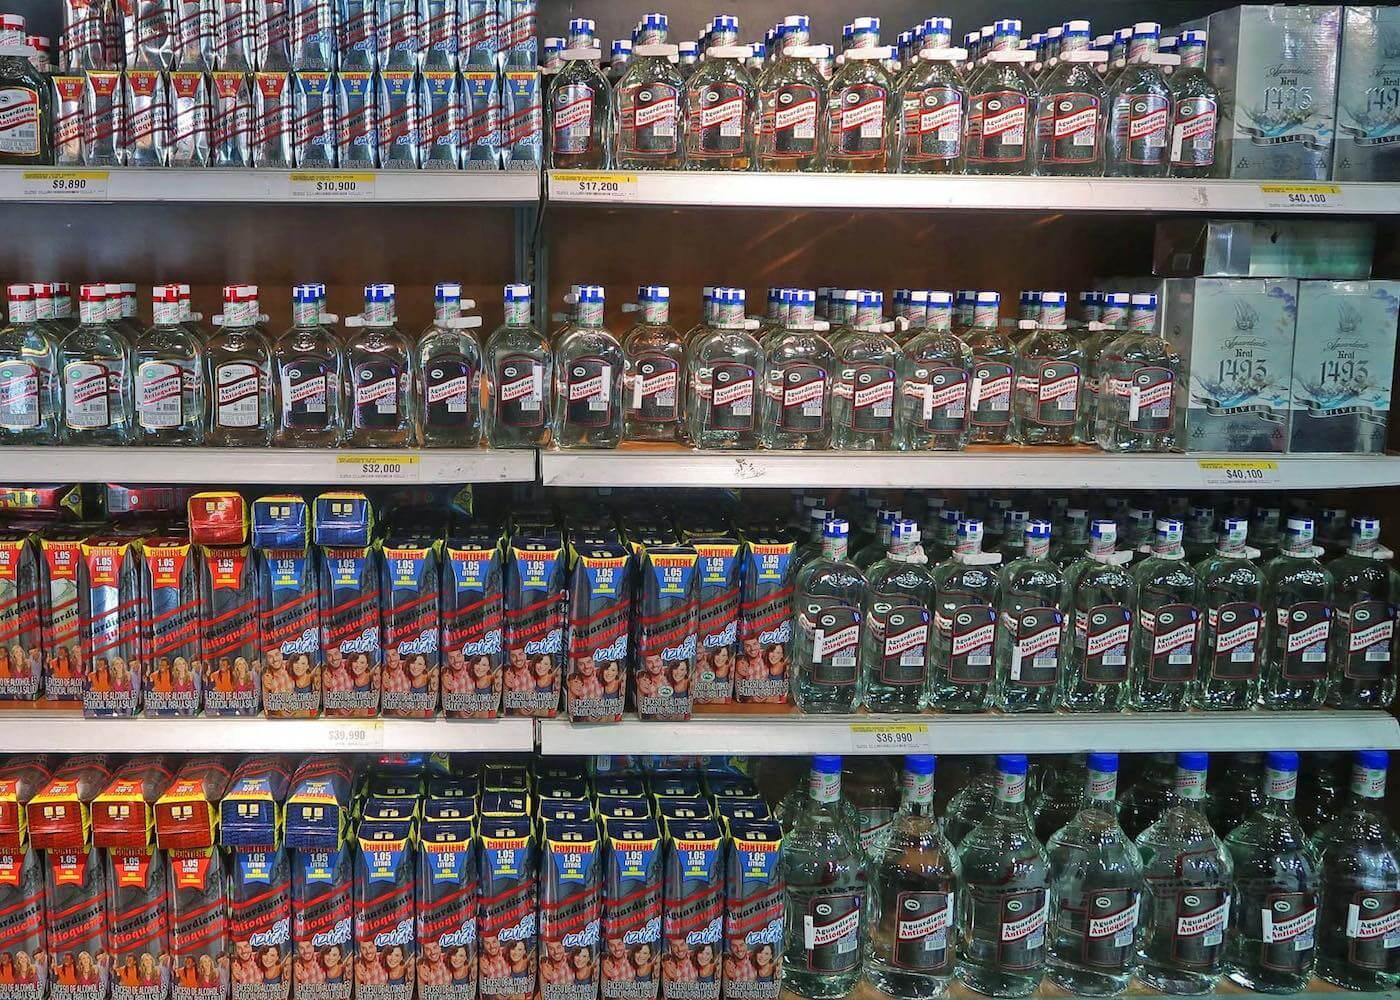 Supermarket shelf full of aguardiente